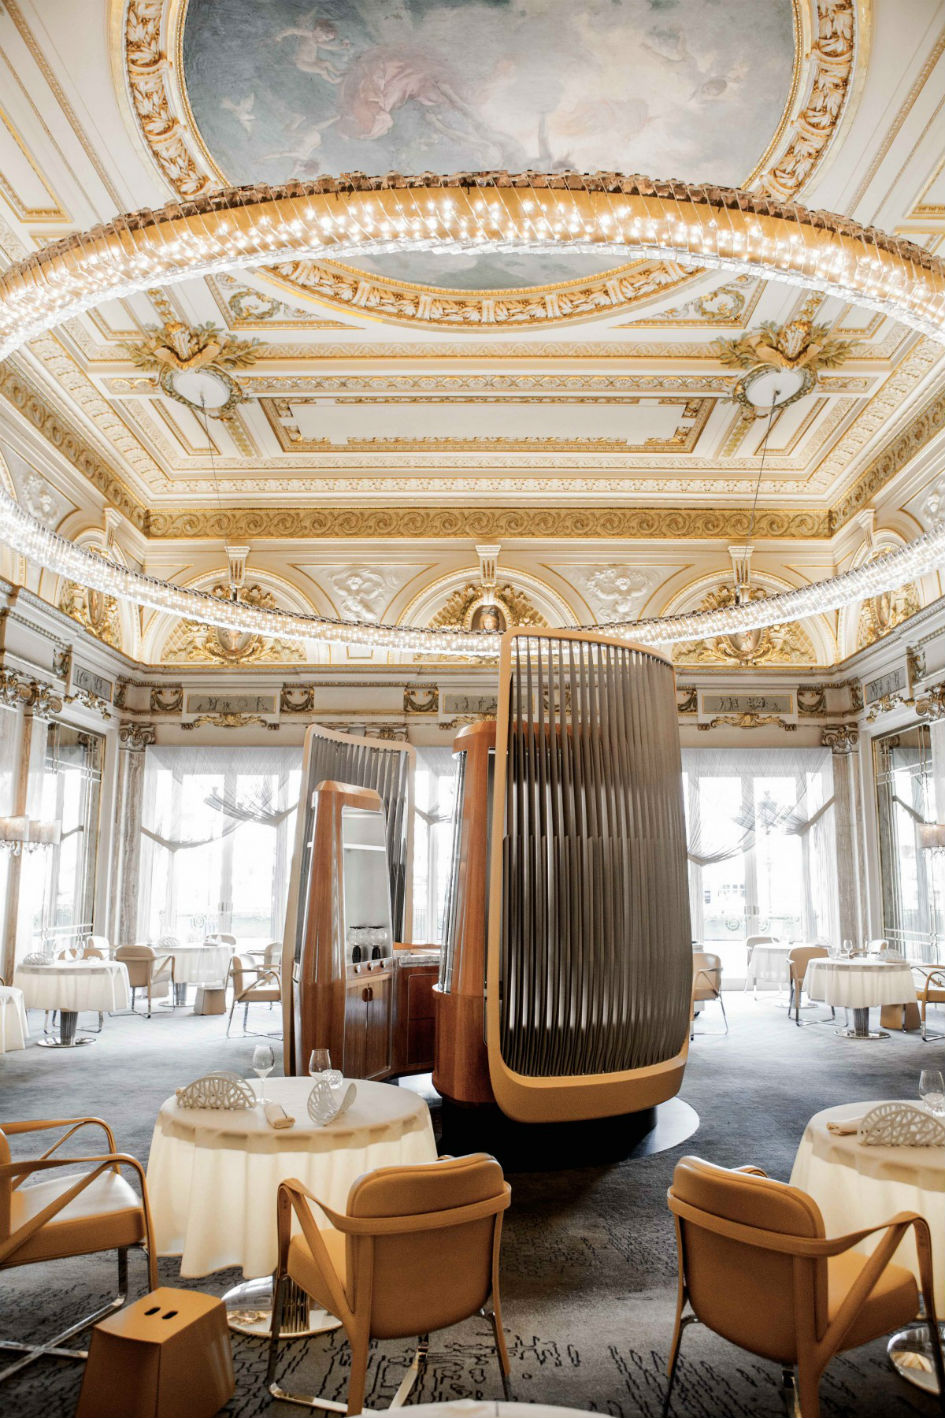 Chef Alain Ducasse Opens New Restaurant in Versailles (3) Alain Ducasse Chef Alain Ducasse Opens New Restaurant in Versailles Chef Alain Ducasse Opens New Restaurant in Versailles 3